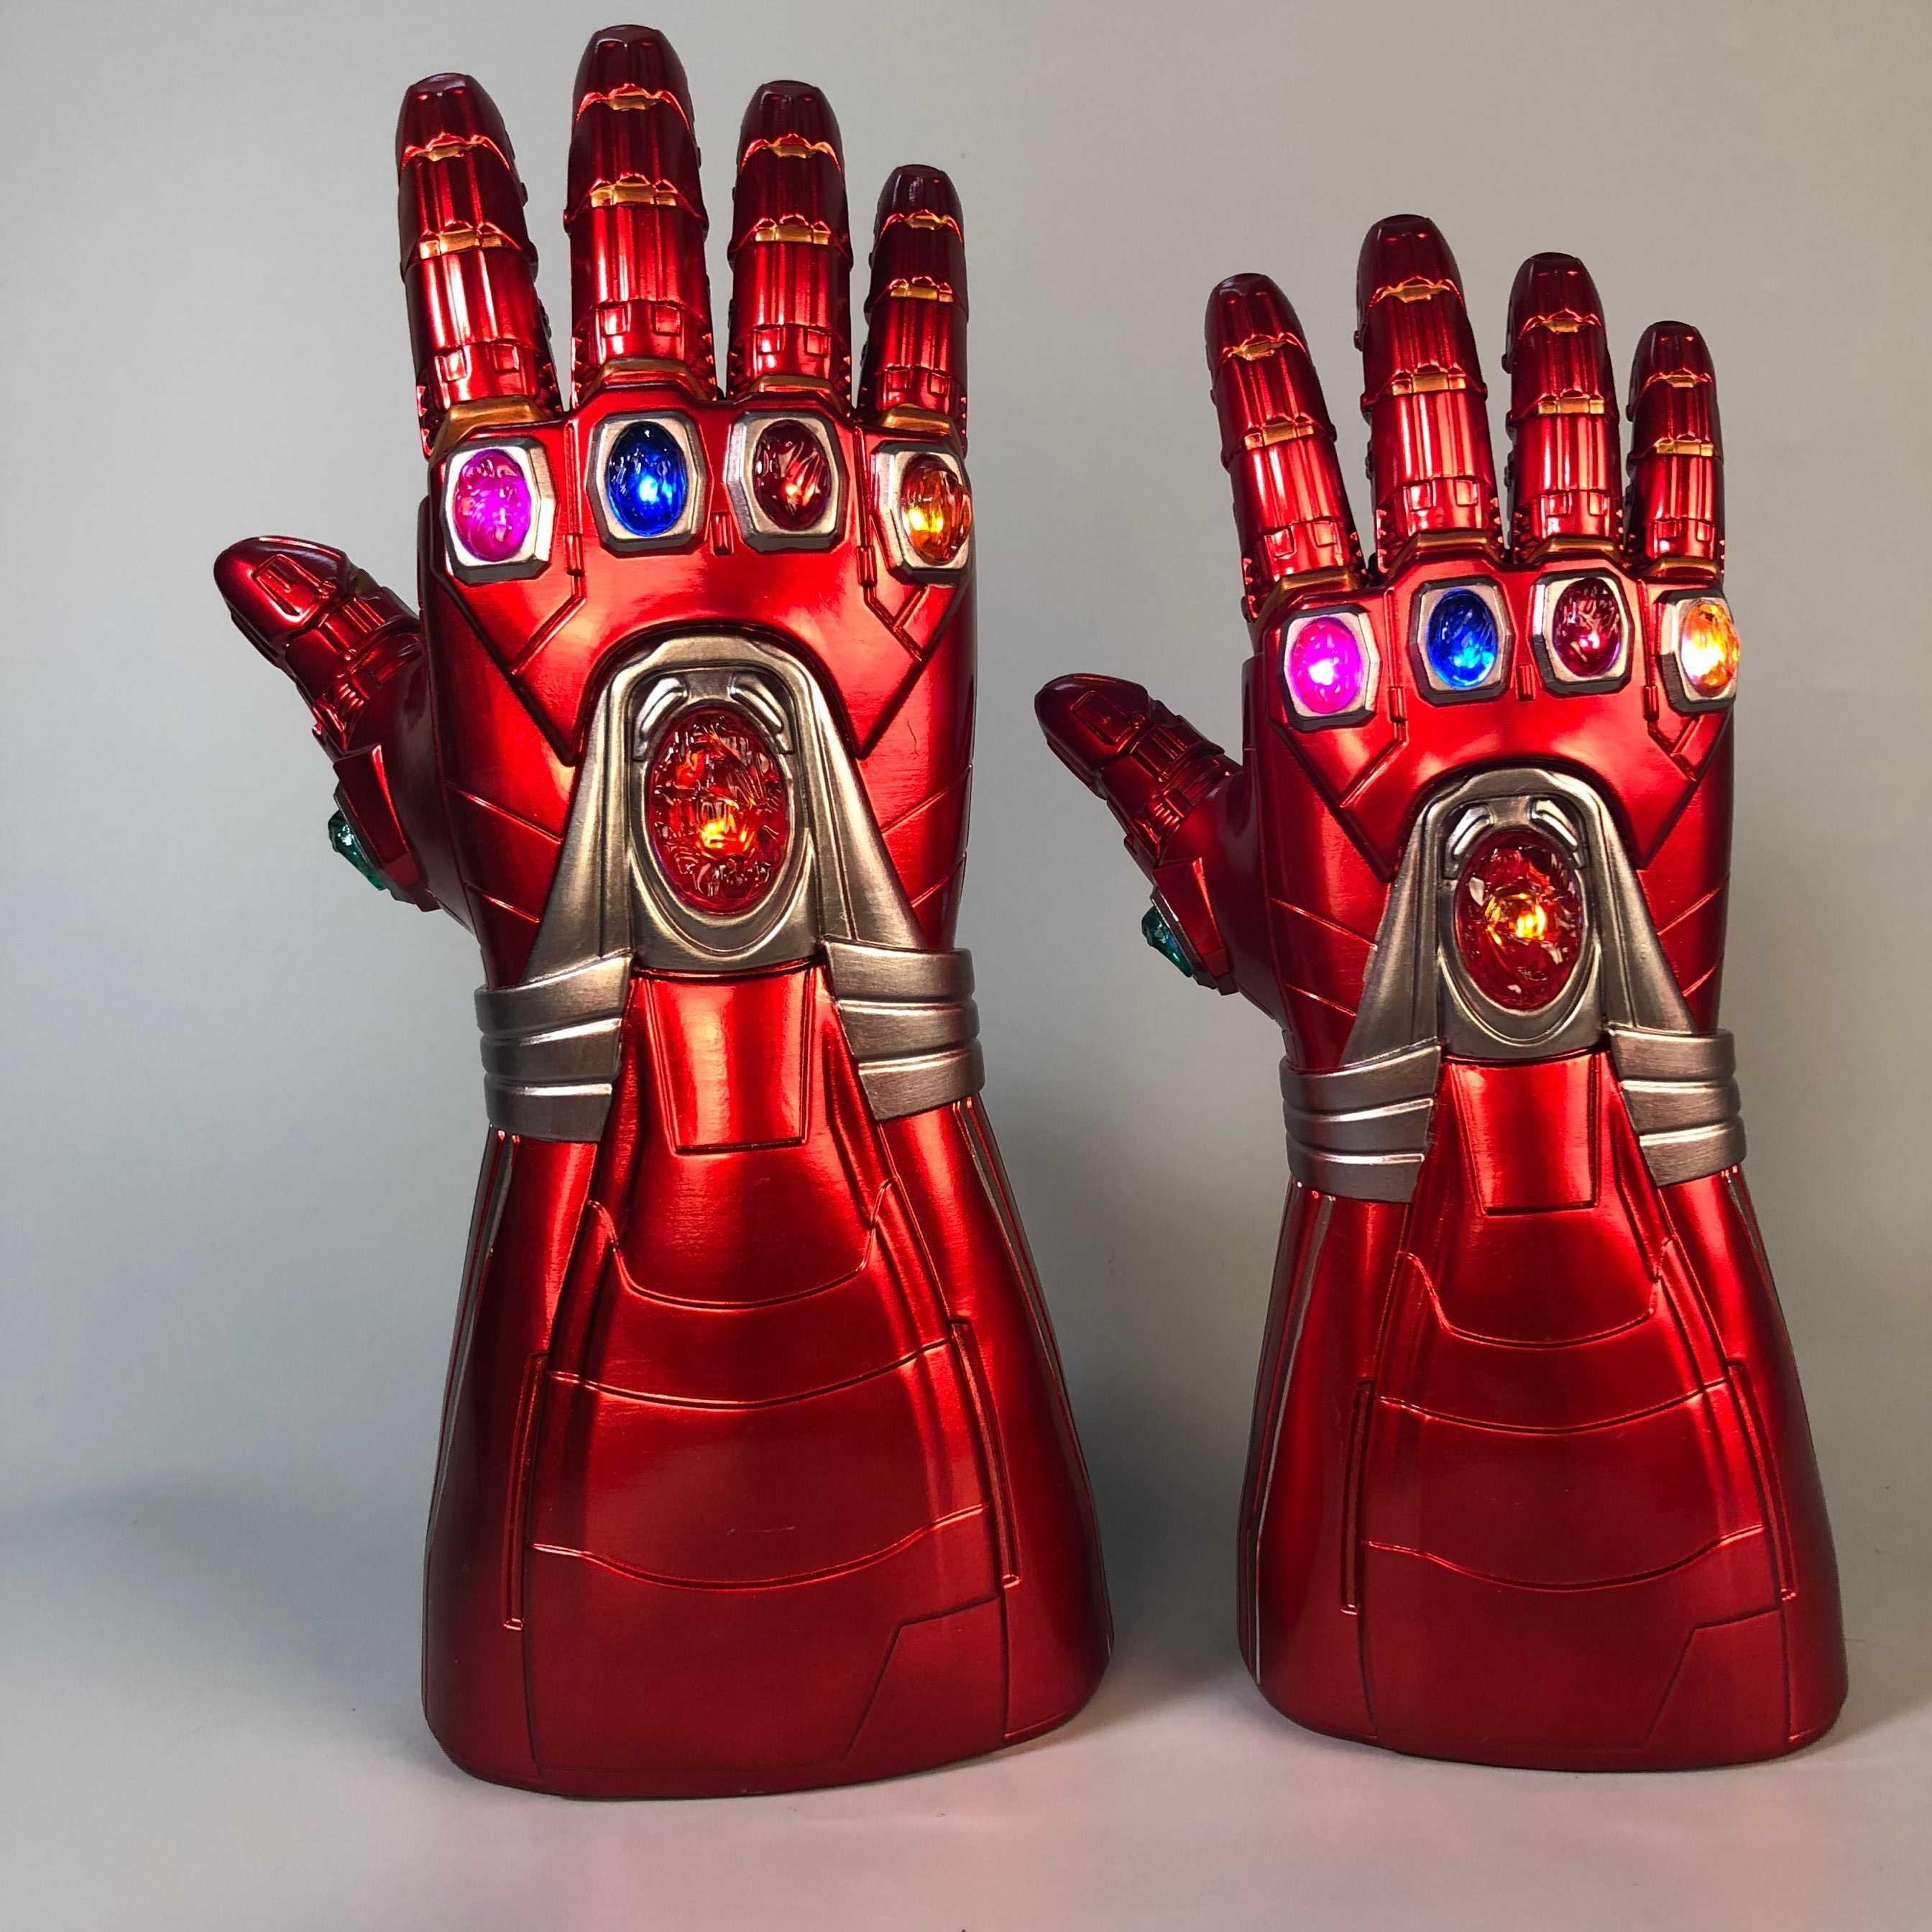 Endgame Iron Man Infinity Gauntlet LED Gloves Tony Stark Superhero Cosplay Prop